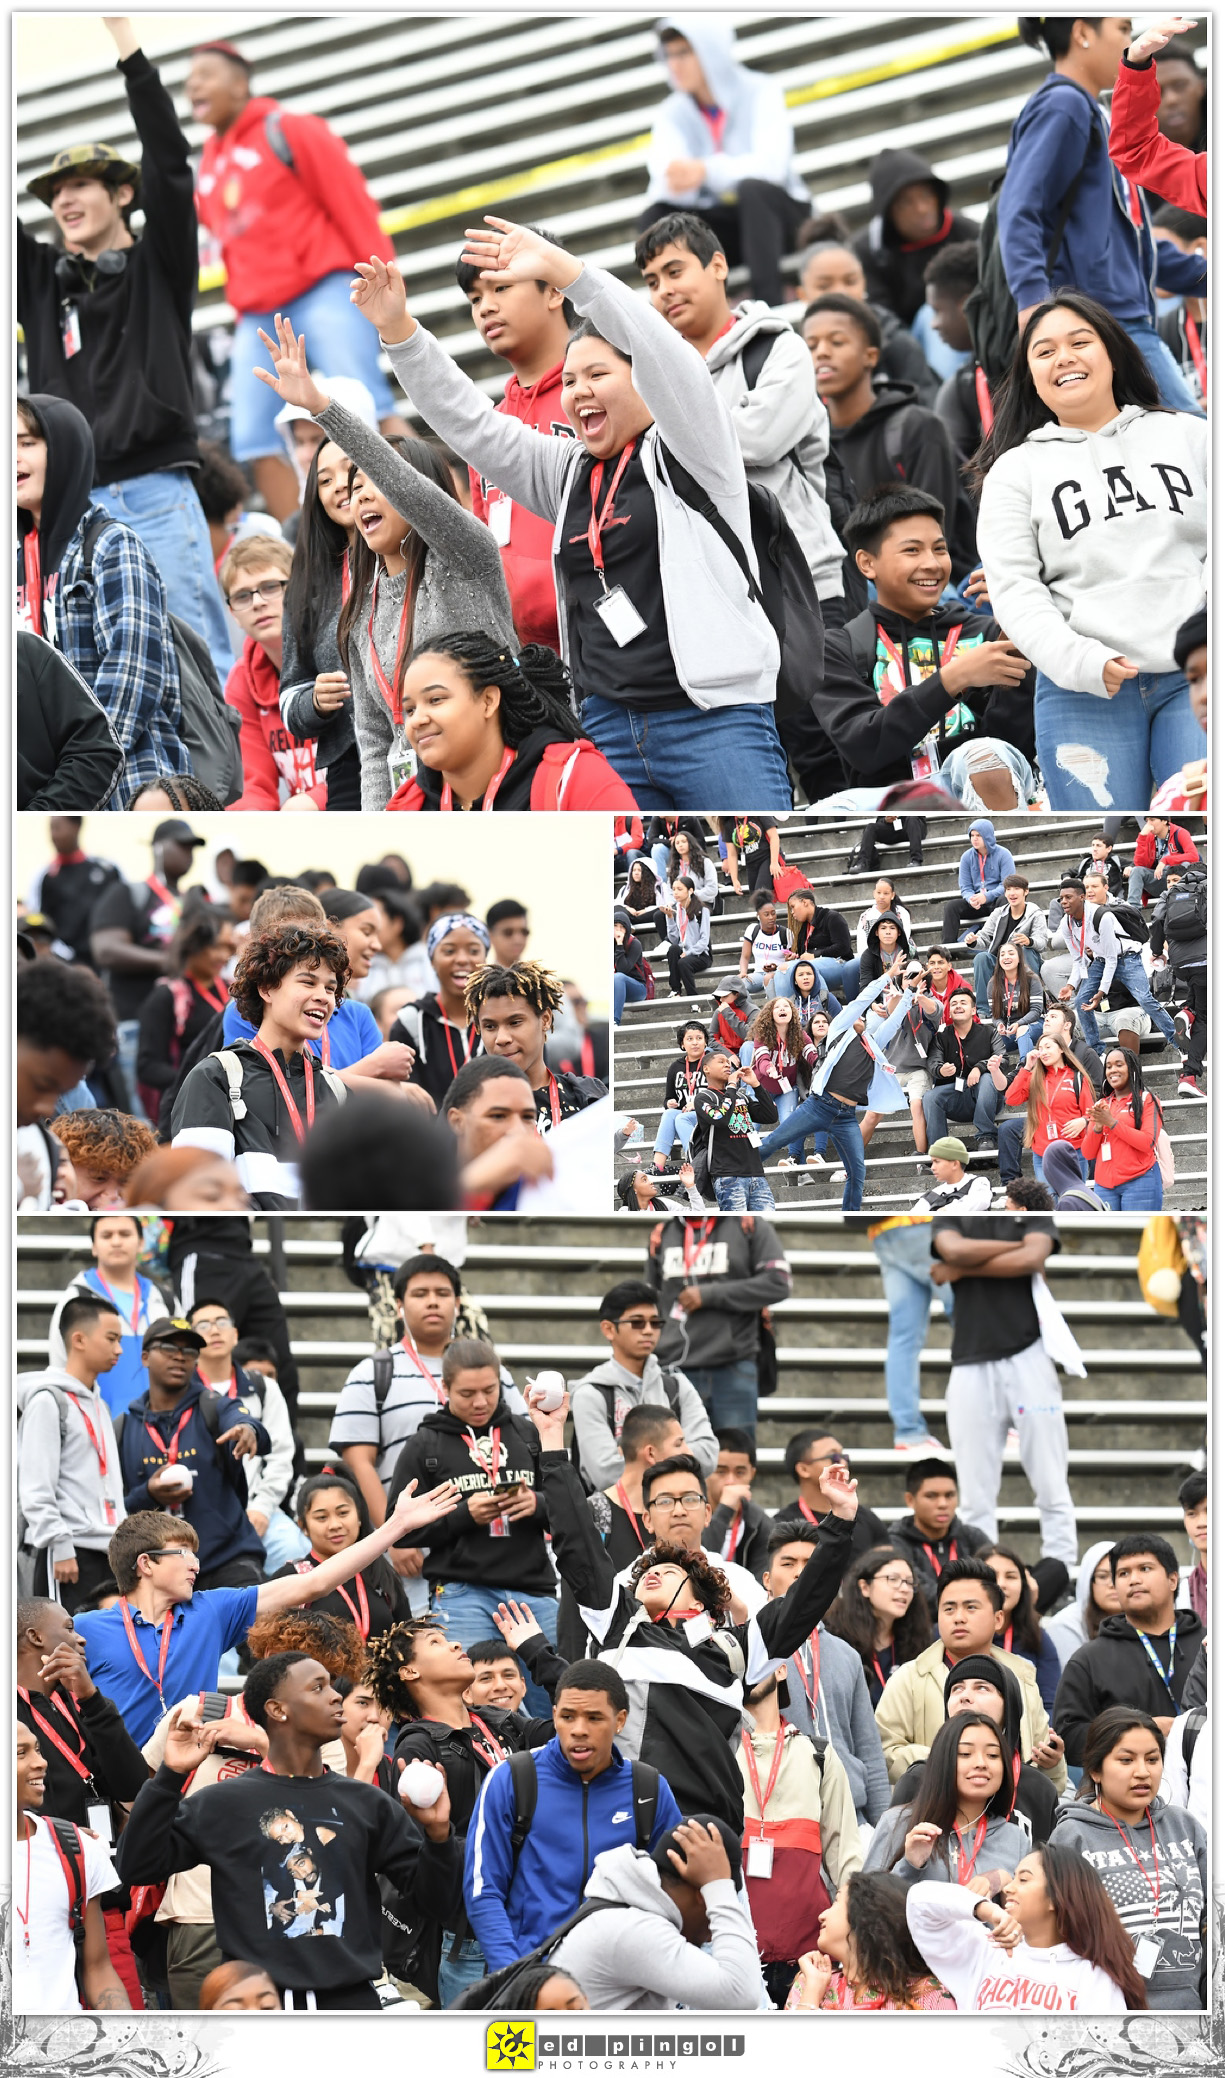 2018.09.06 - PitCCh In at Vallejo High School 003.JPG